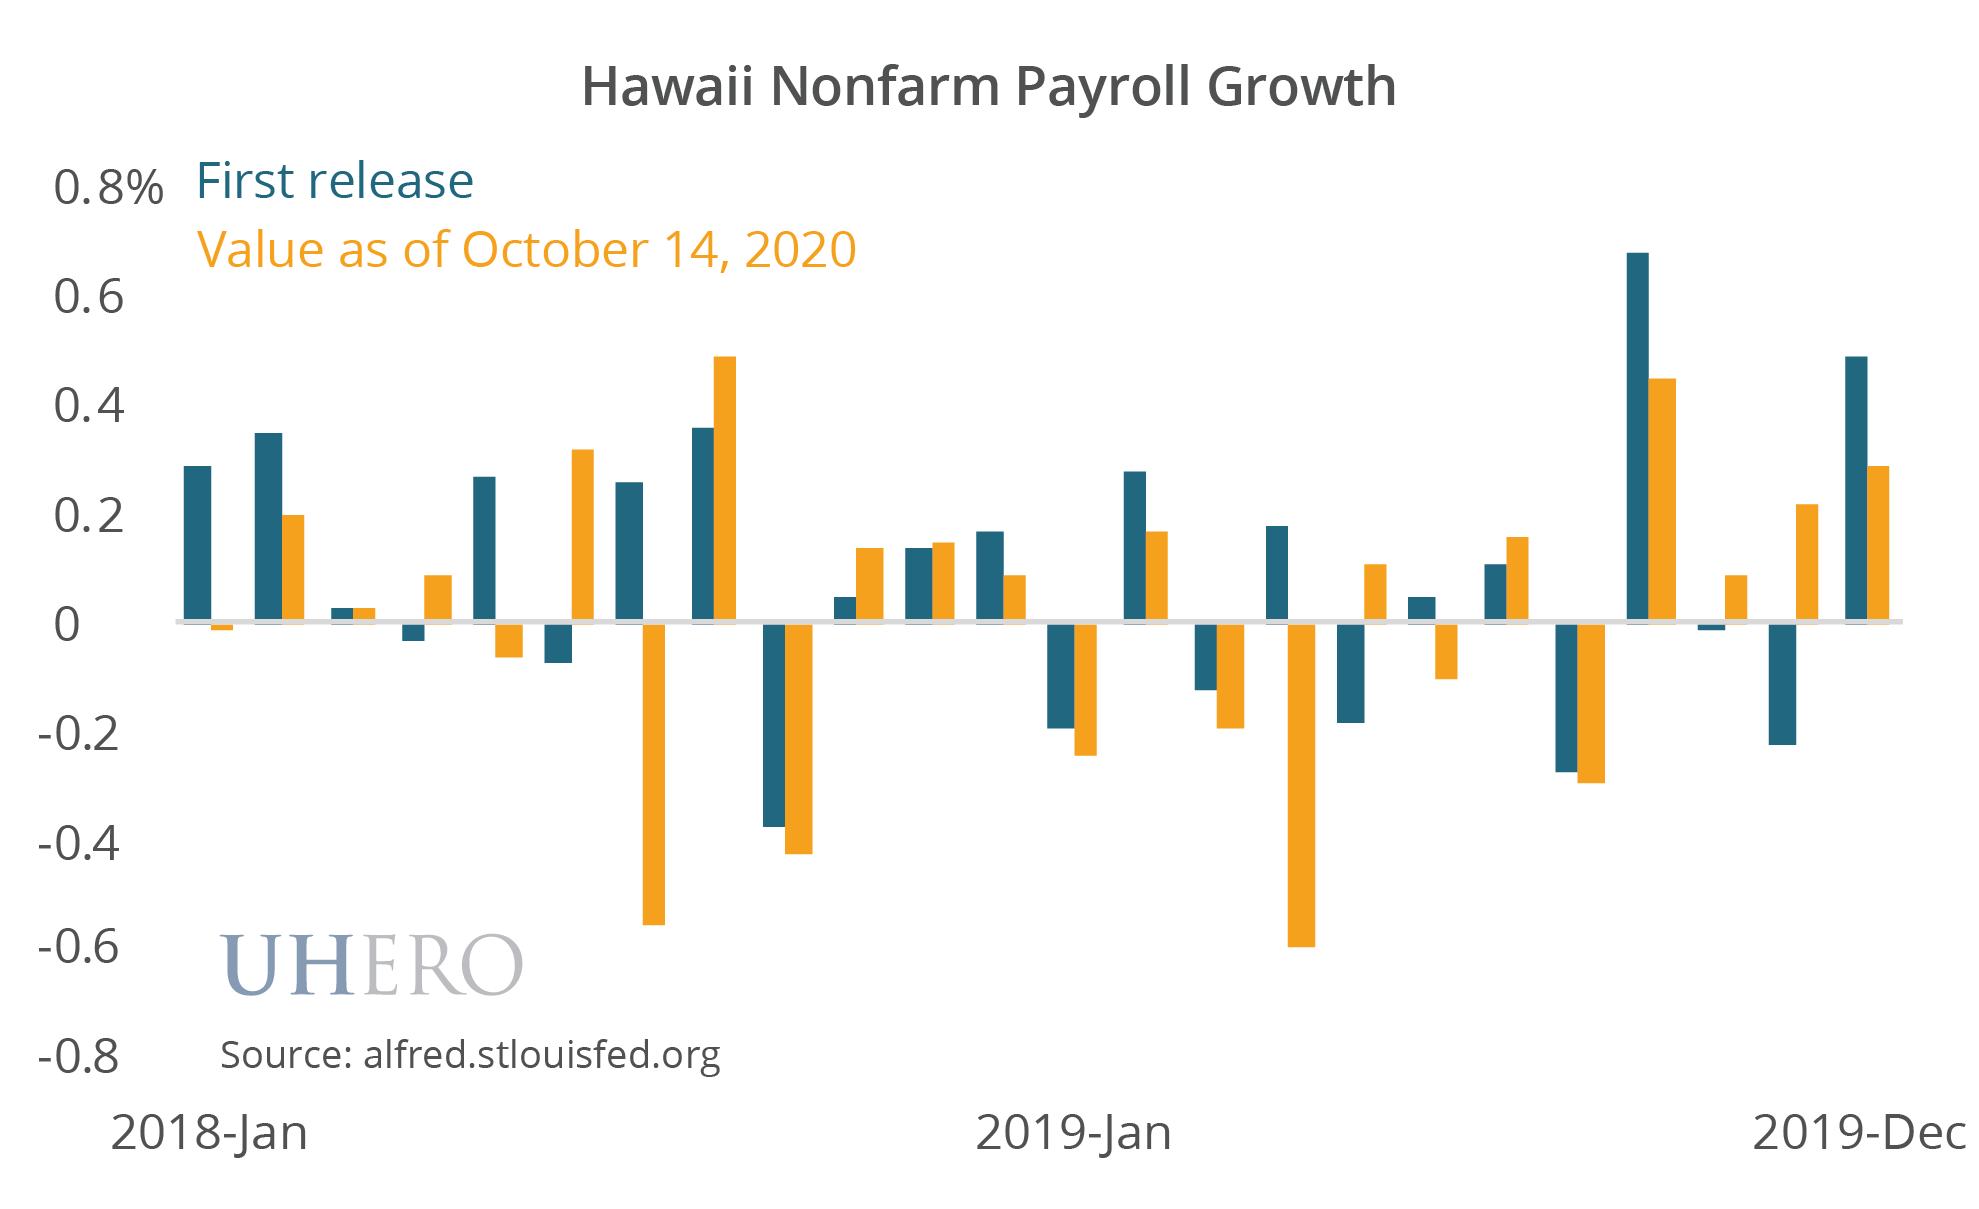 Hawaii Nonfarm Payroll Growth